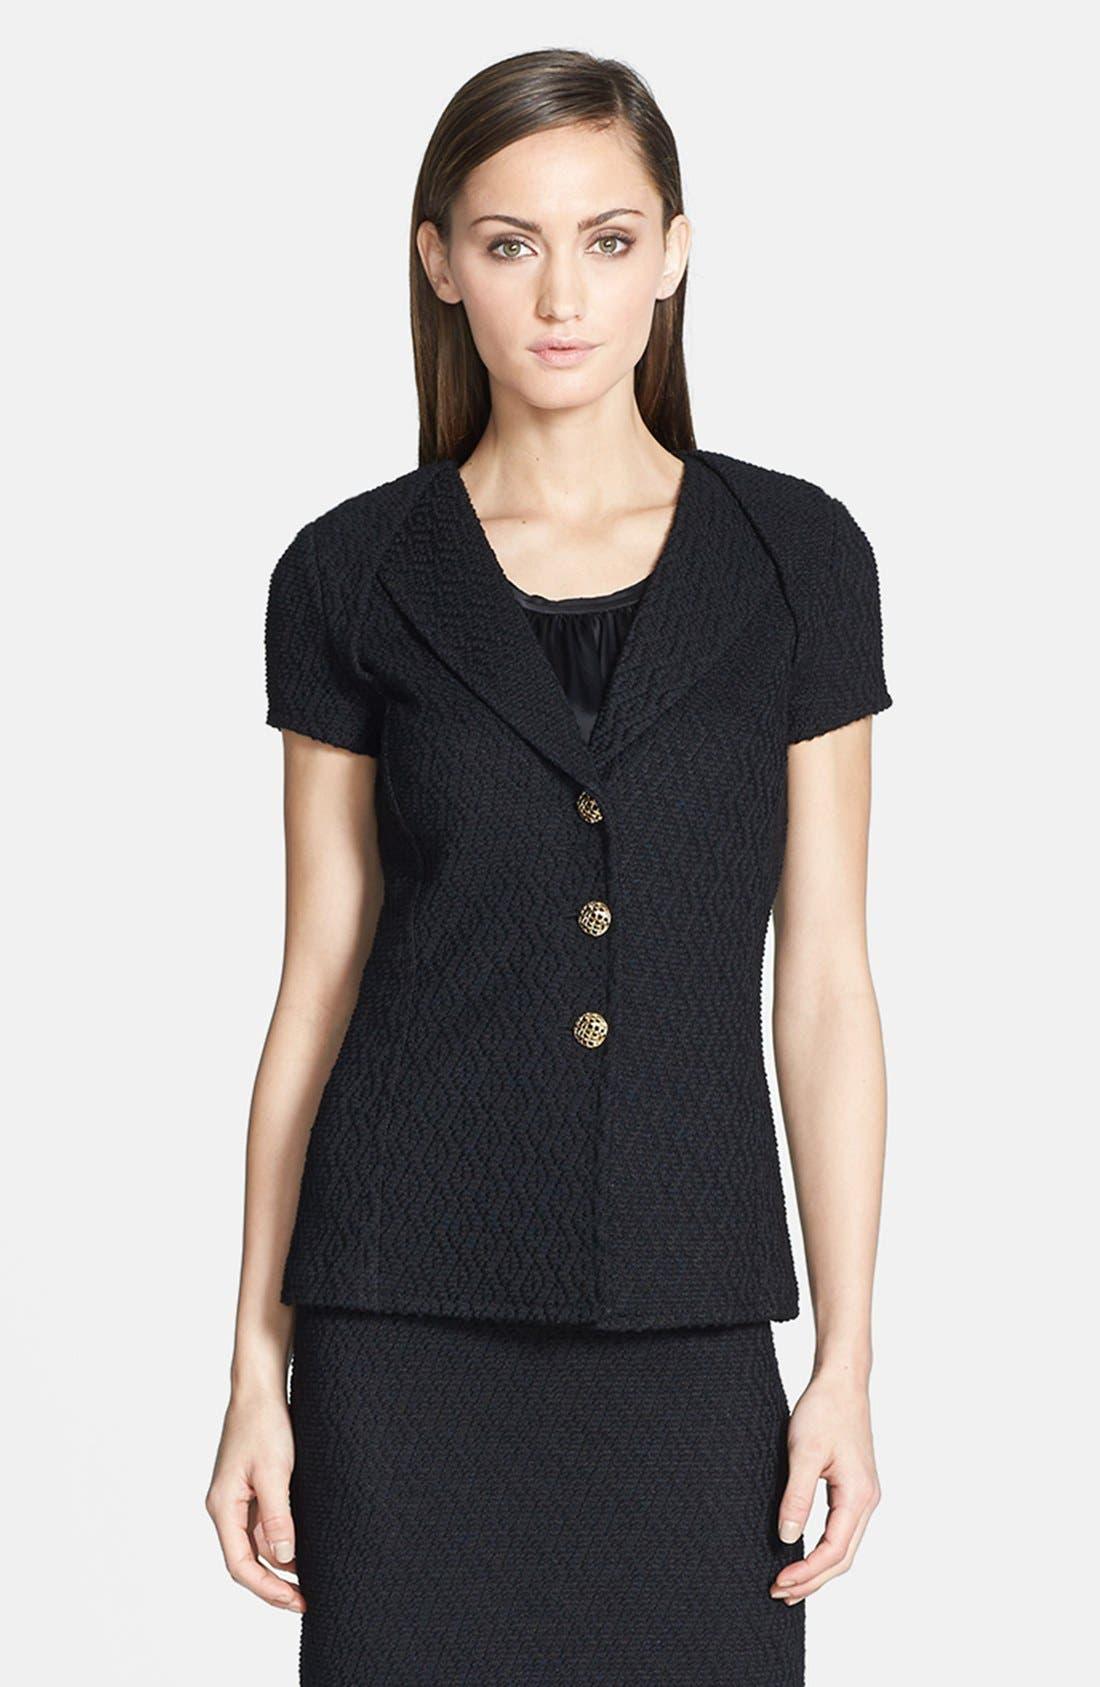 Main Image - St. John Collection Tuck Lapel Collar Diamond Dash Knit Jacket